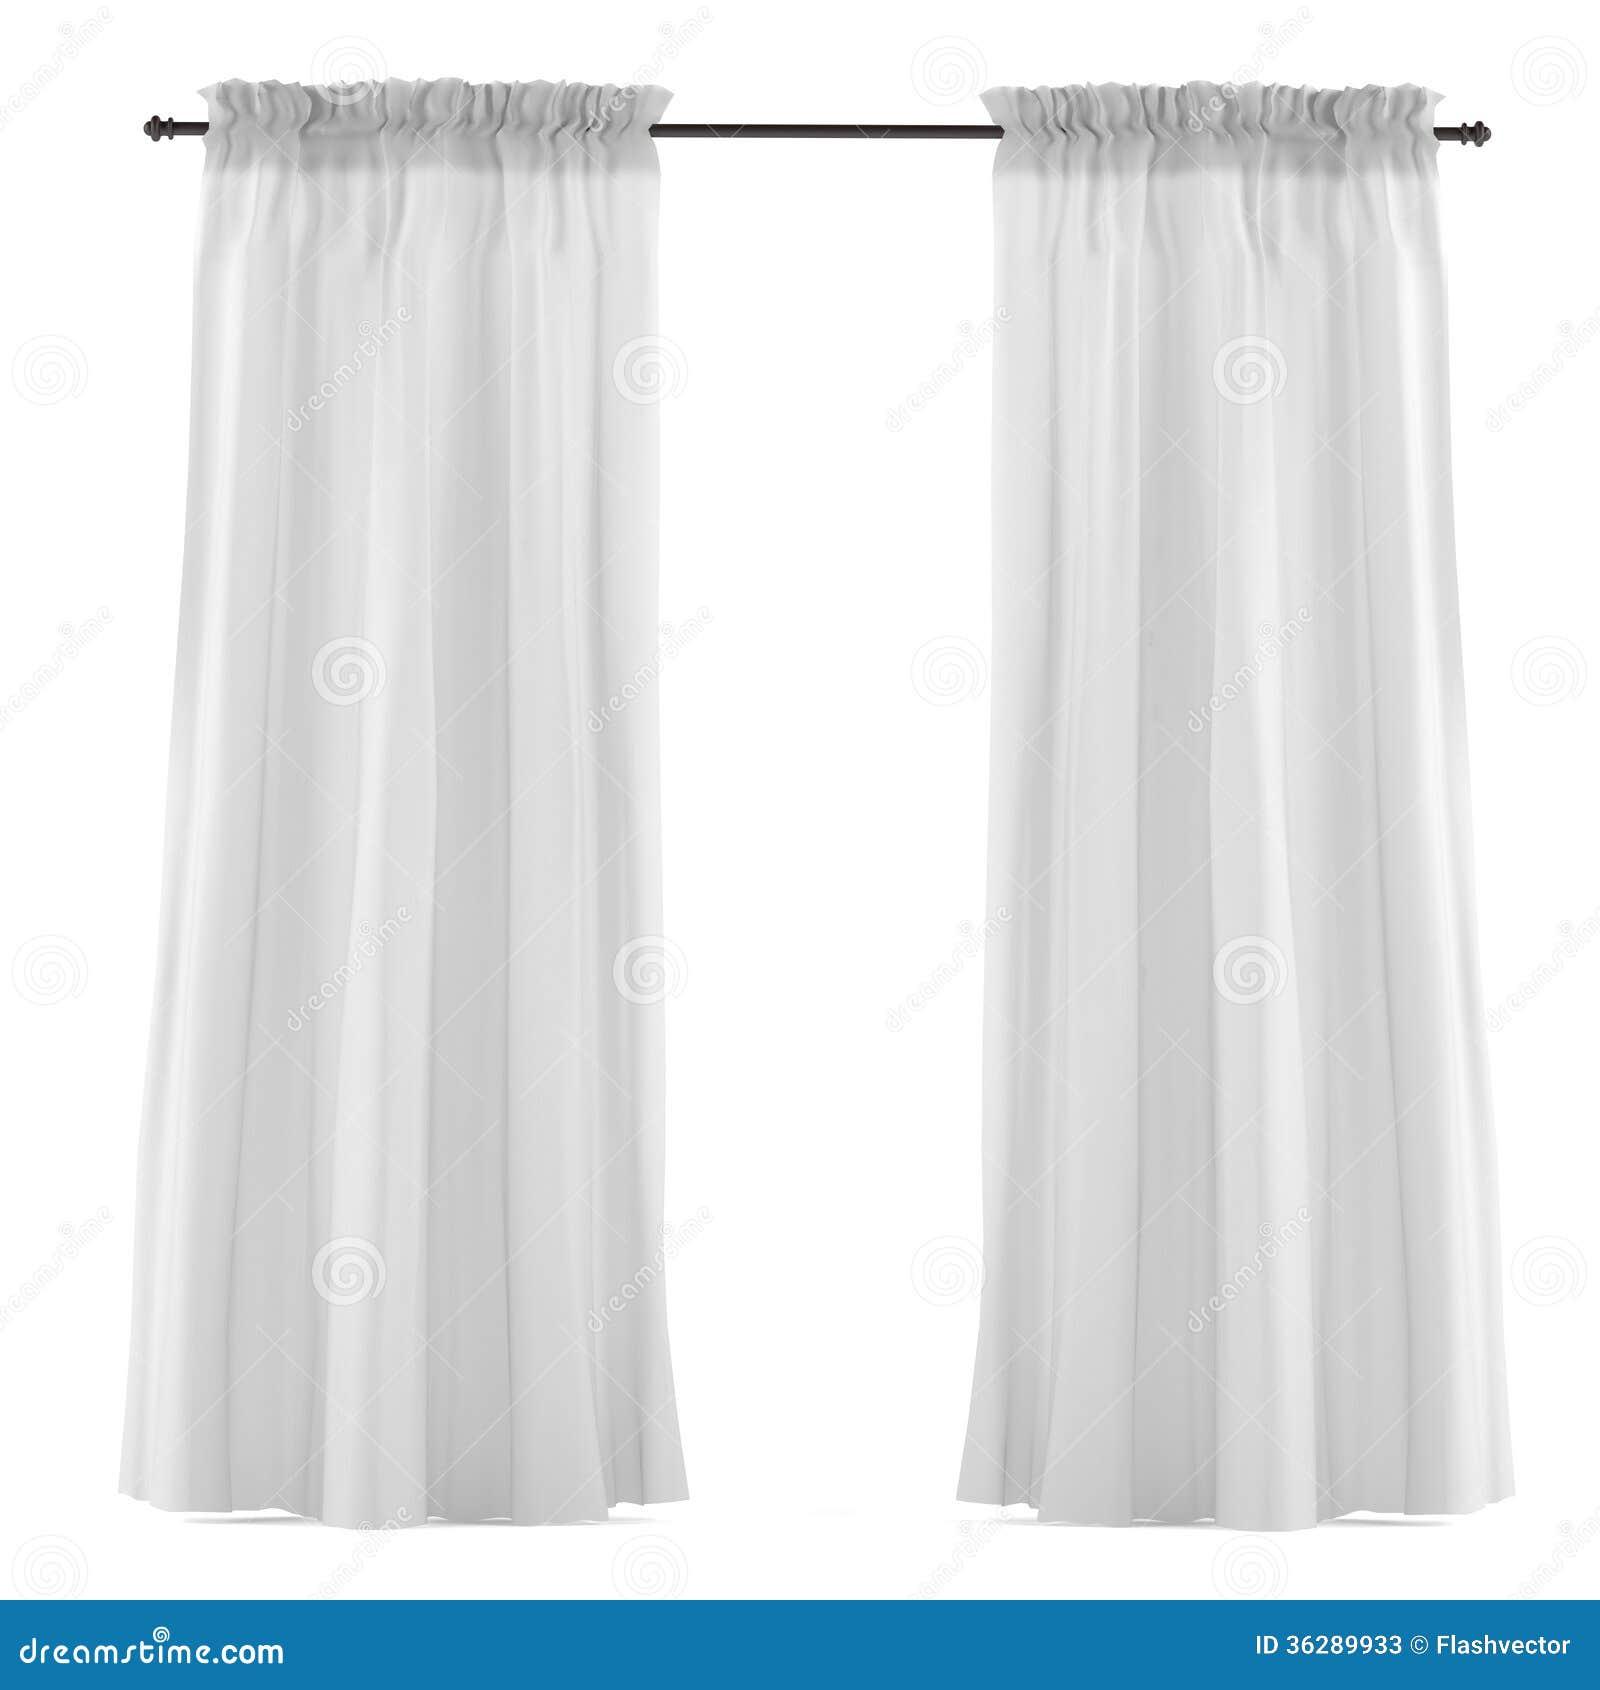 rideau gris blanc d 39 isolement photos stock image 36289933. Black Bedroom Furniture Sets. Home Design Ideas